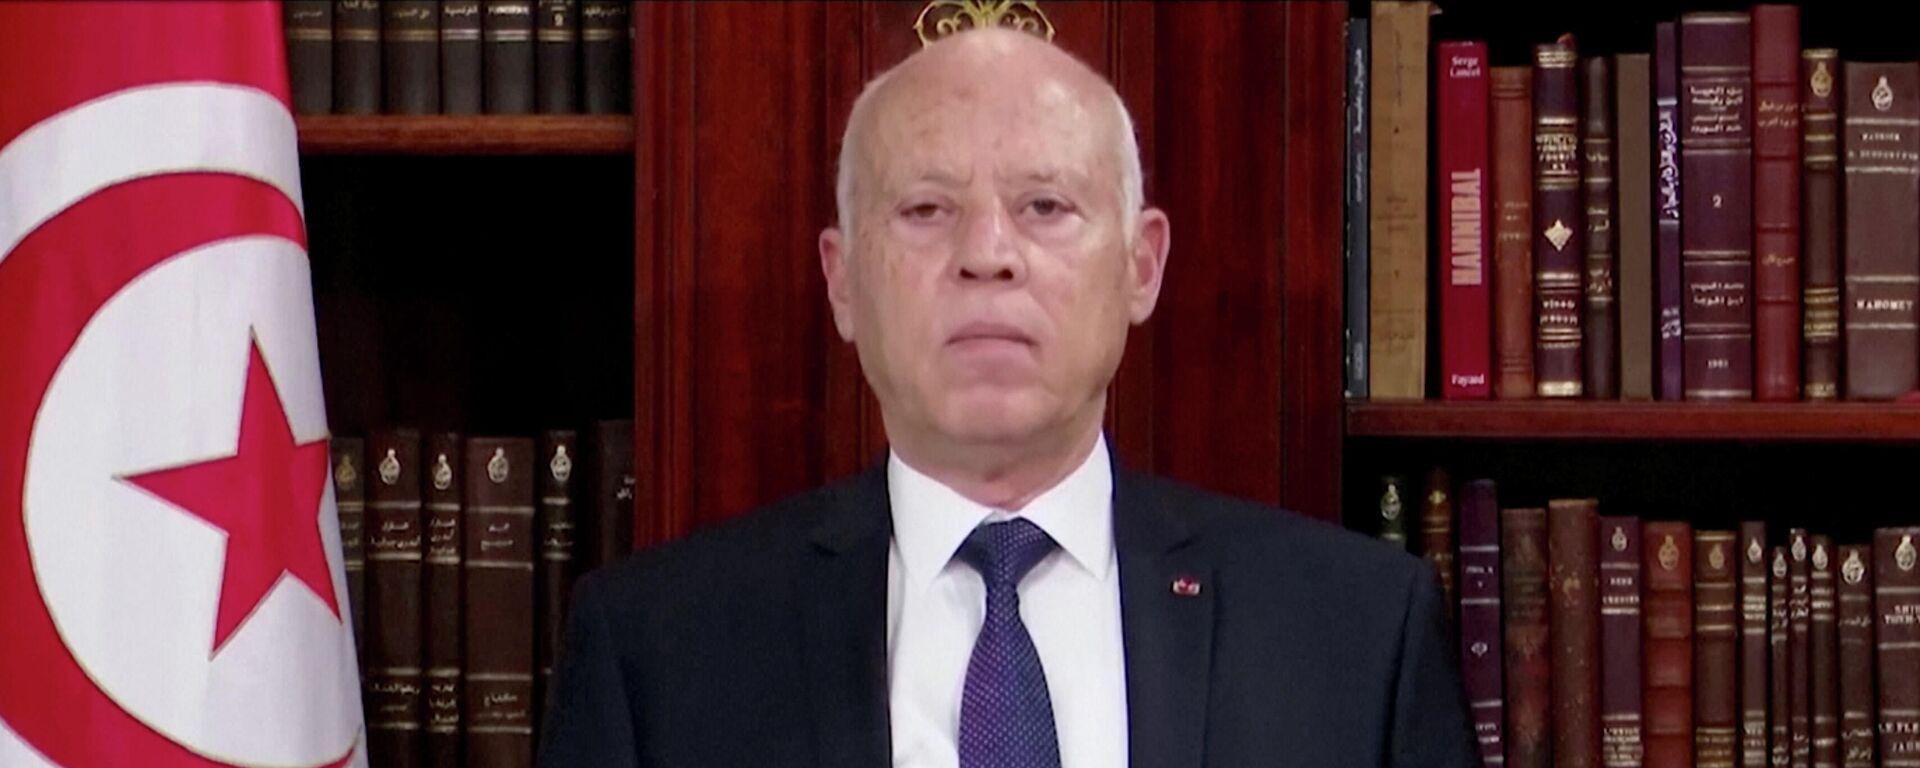 Kais Saied, presidente de Túnez - Sputnik Mundo, 1920, 26.07.2021